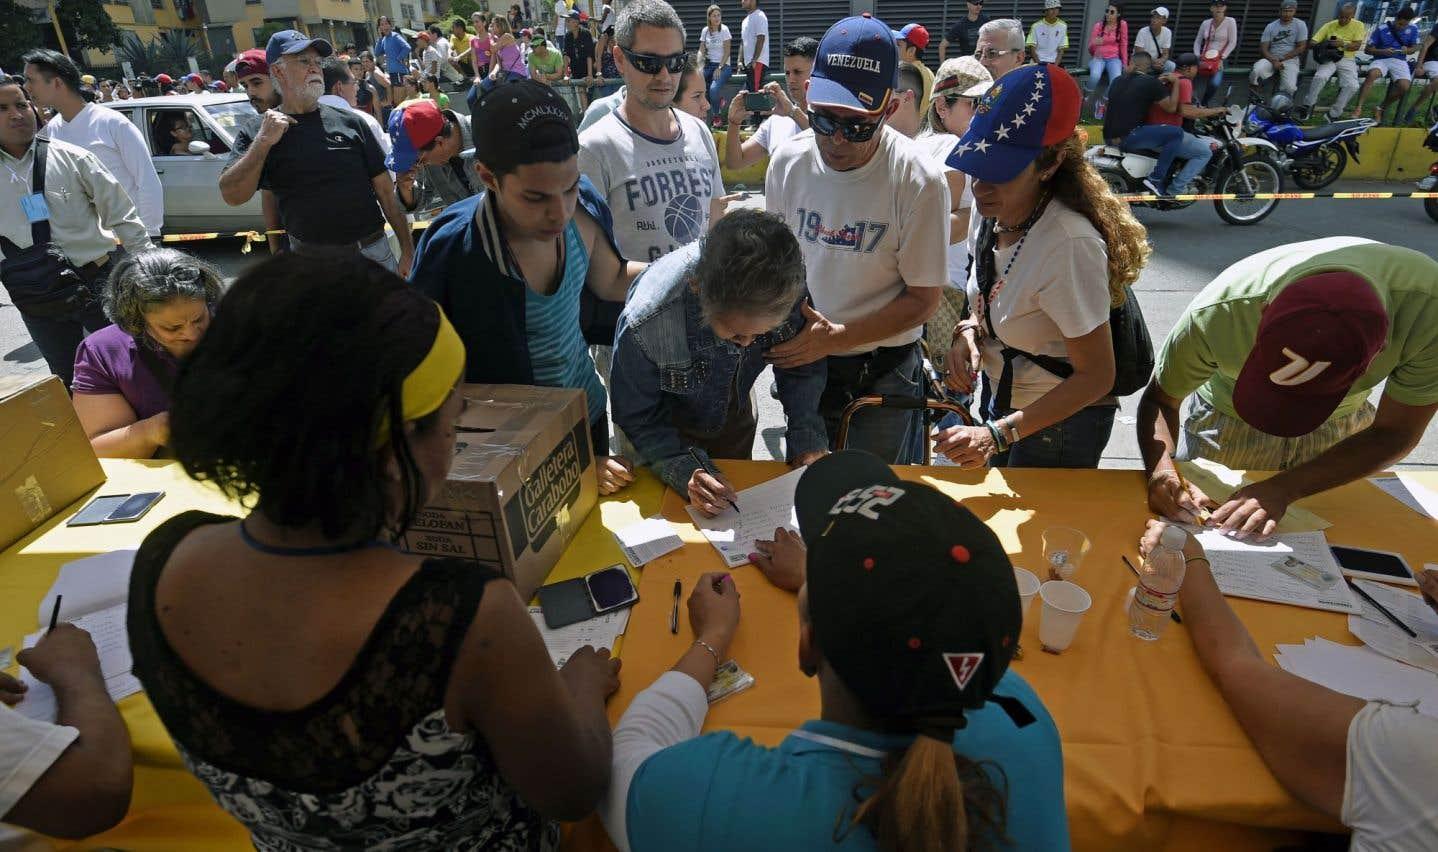 Aux urnes contre la Constituante de Maduro